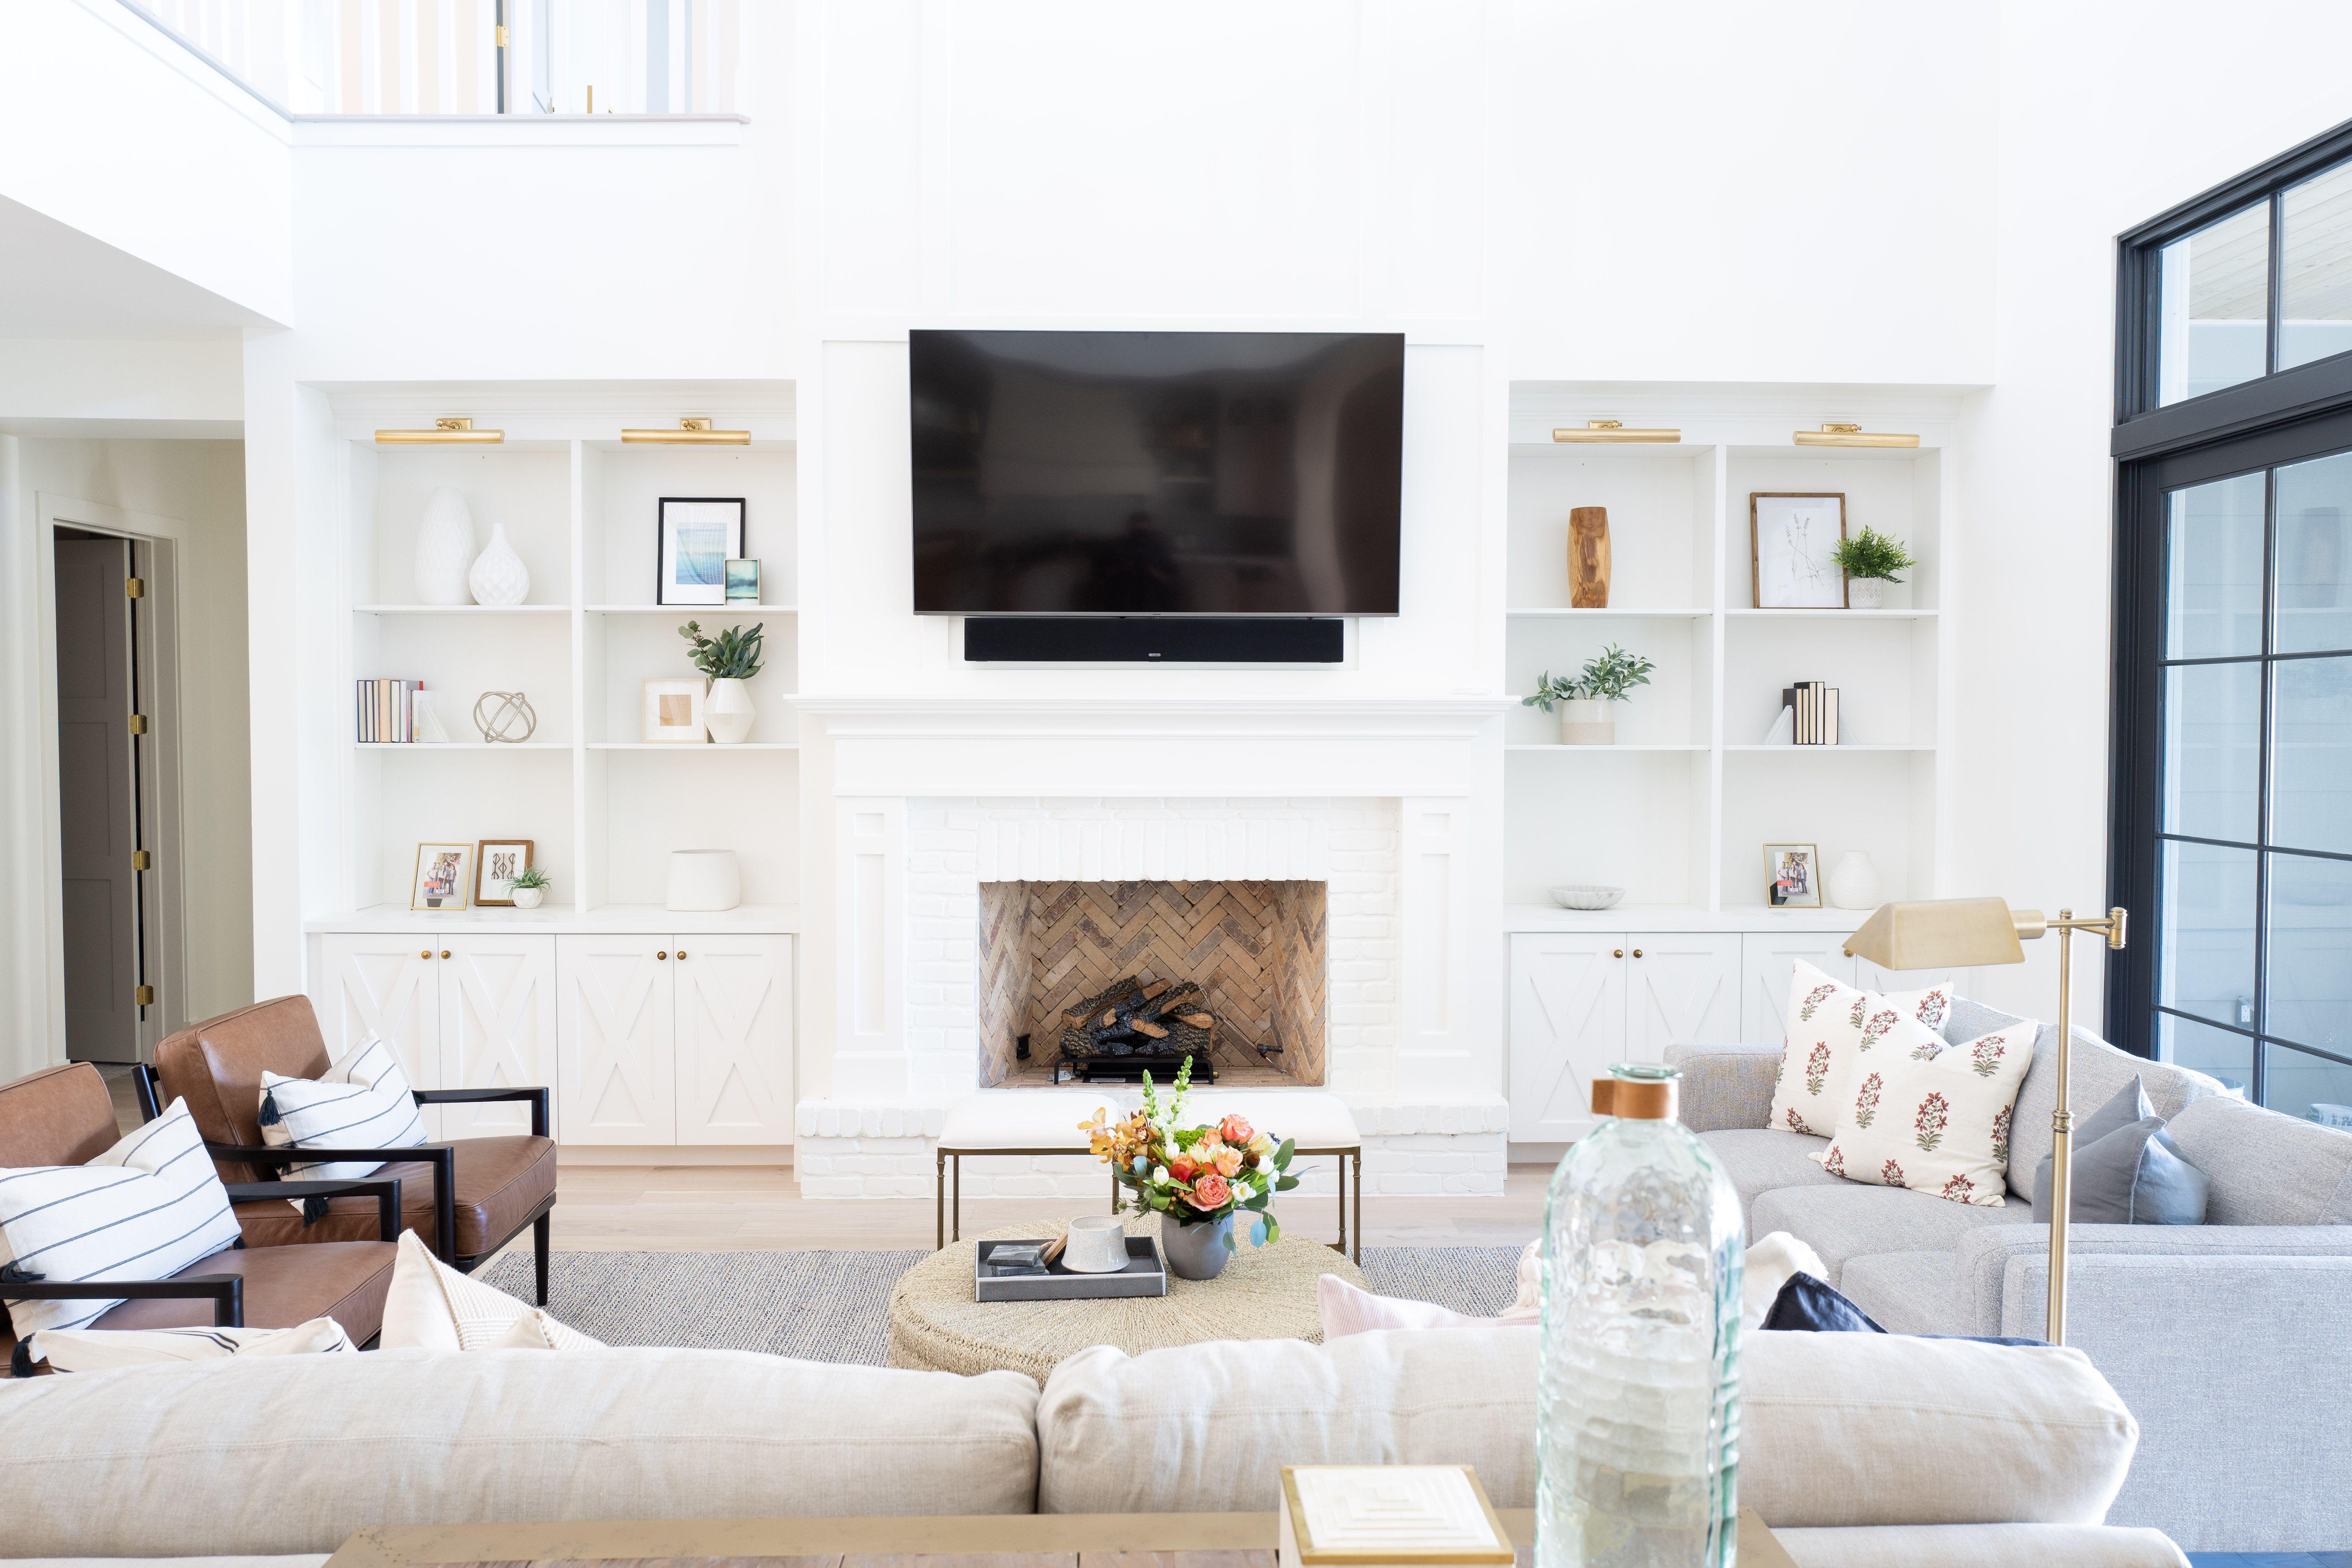 E Interiors Dc Ranch Project Fireplace Built Ins In 2020 Home Fireplace Built Ins Home Living Room